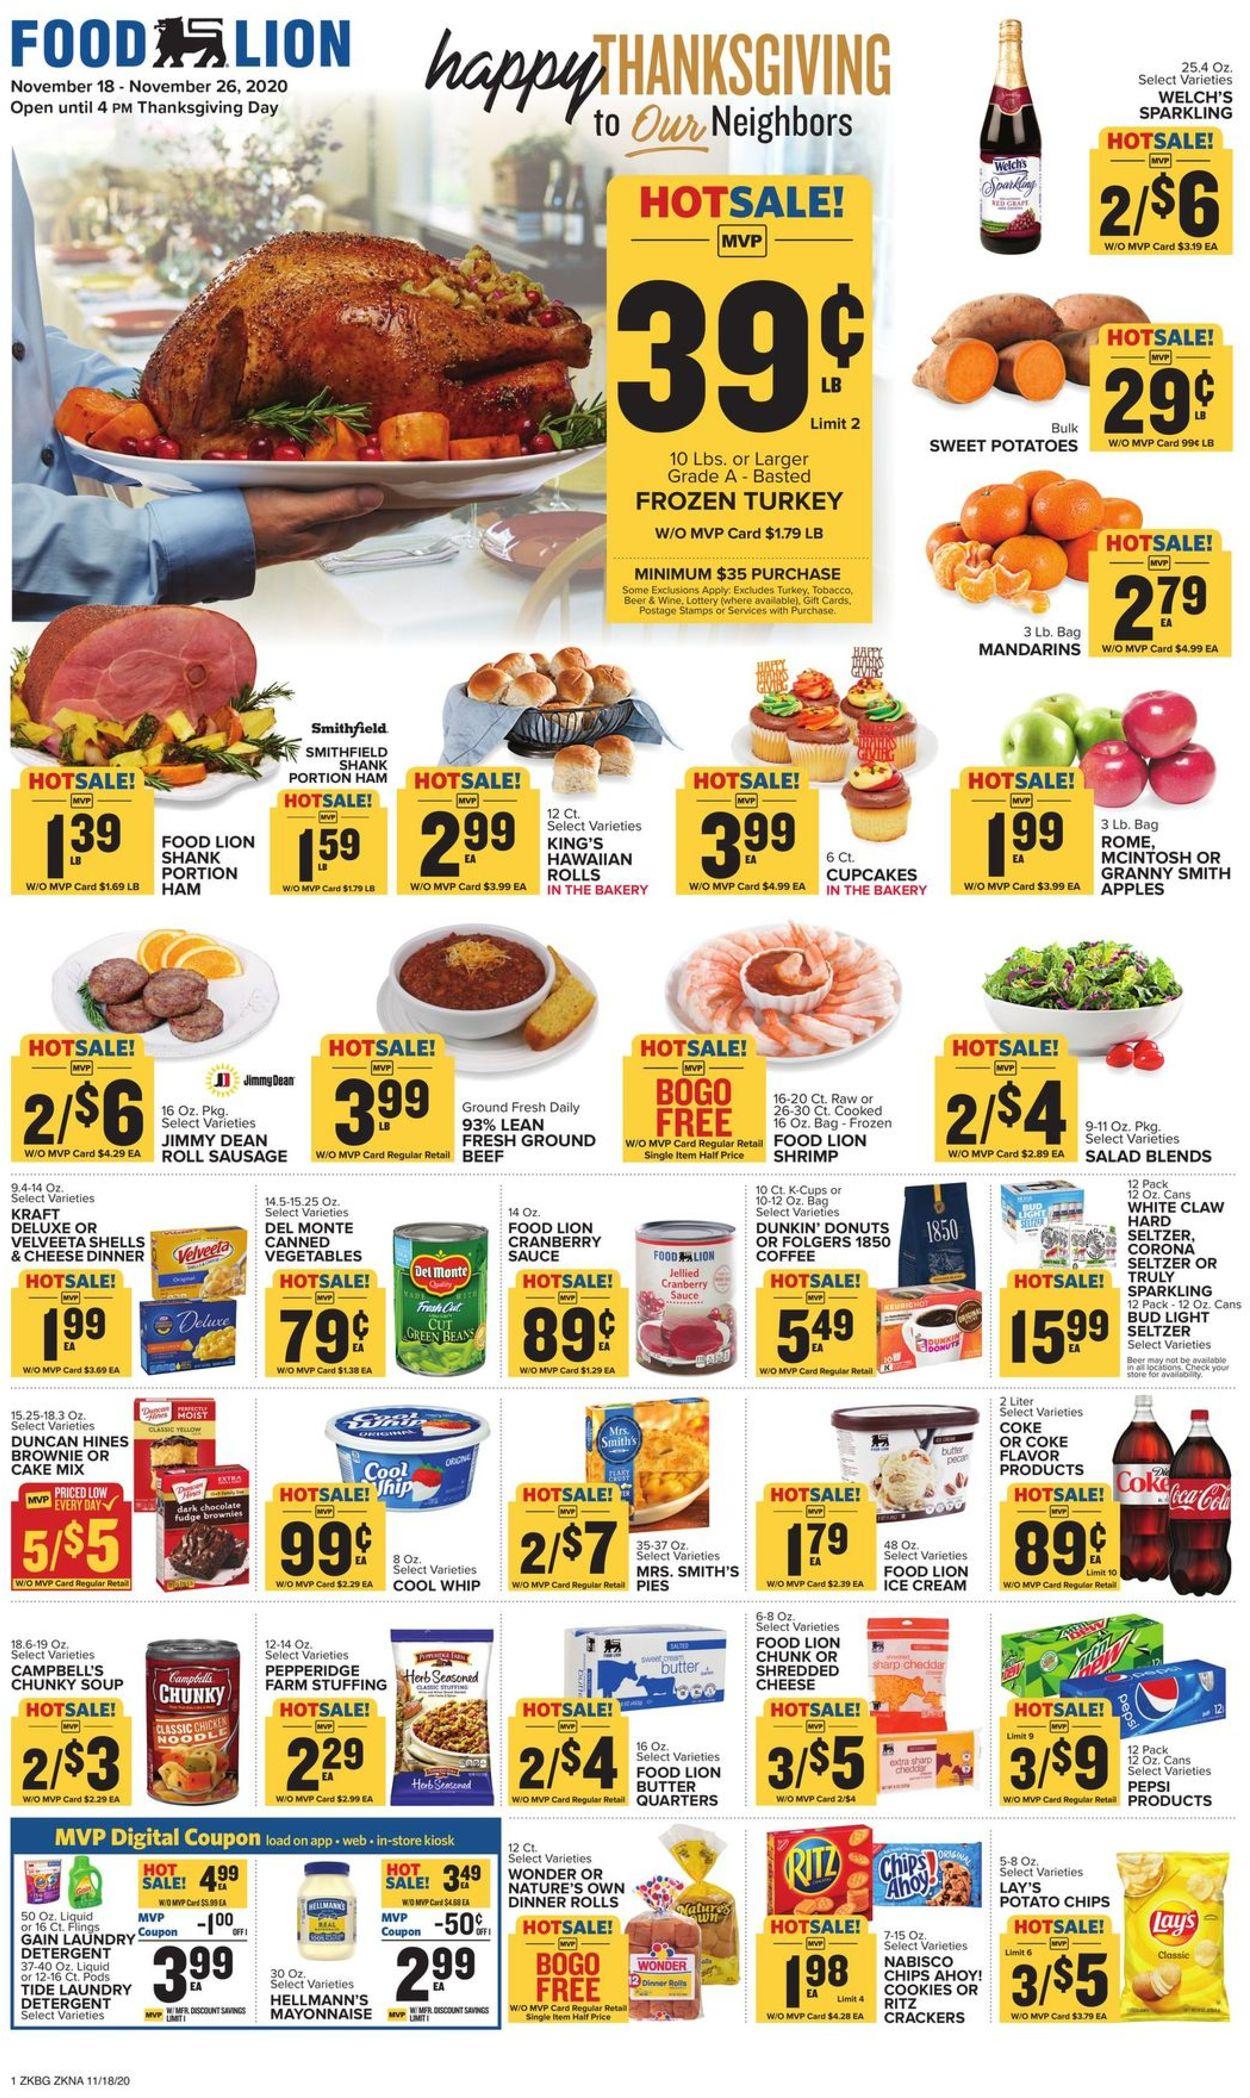 Food Lion Thanksgiving 2020 Weekly Ad Circular - valid 11/18-11/26/2020